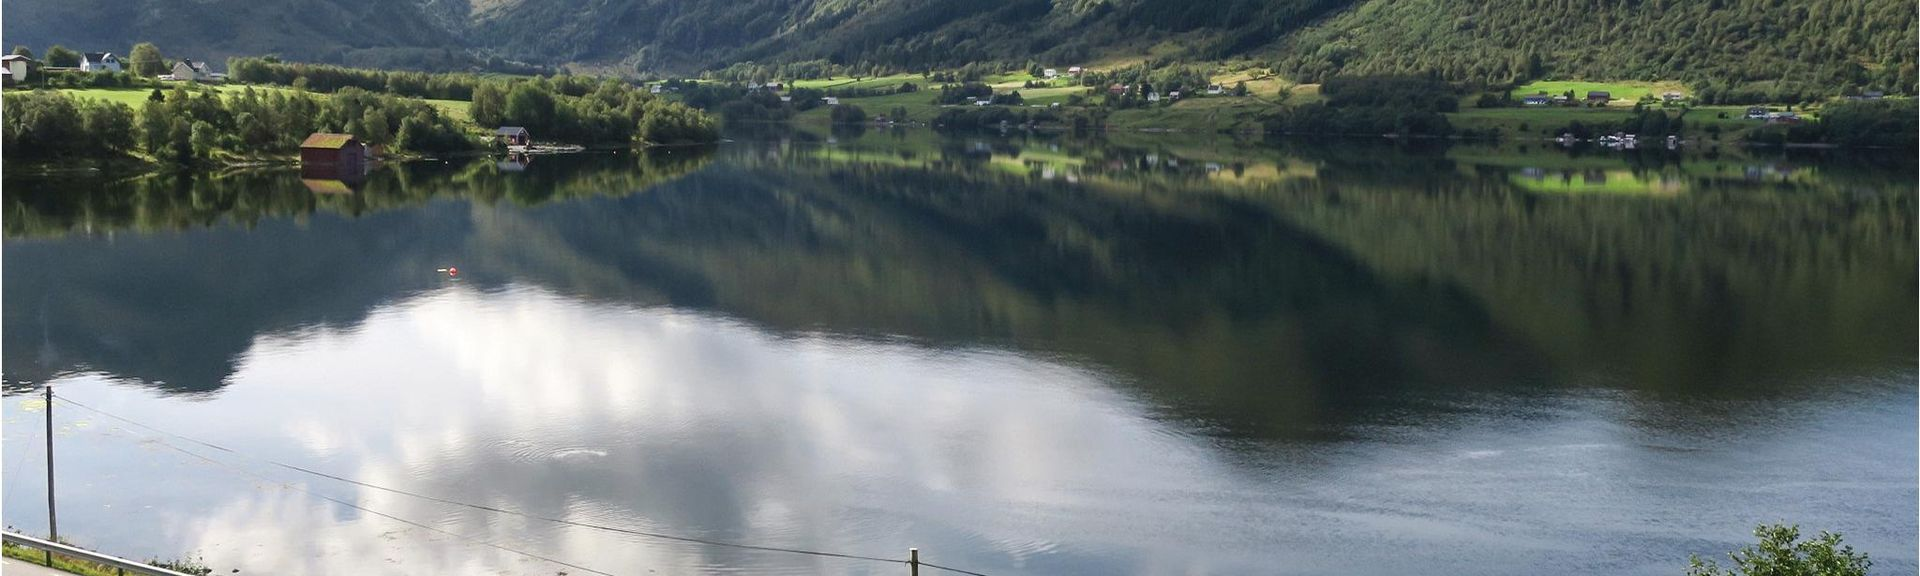 Flatraket, Norway